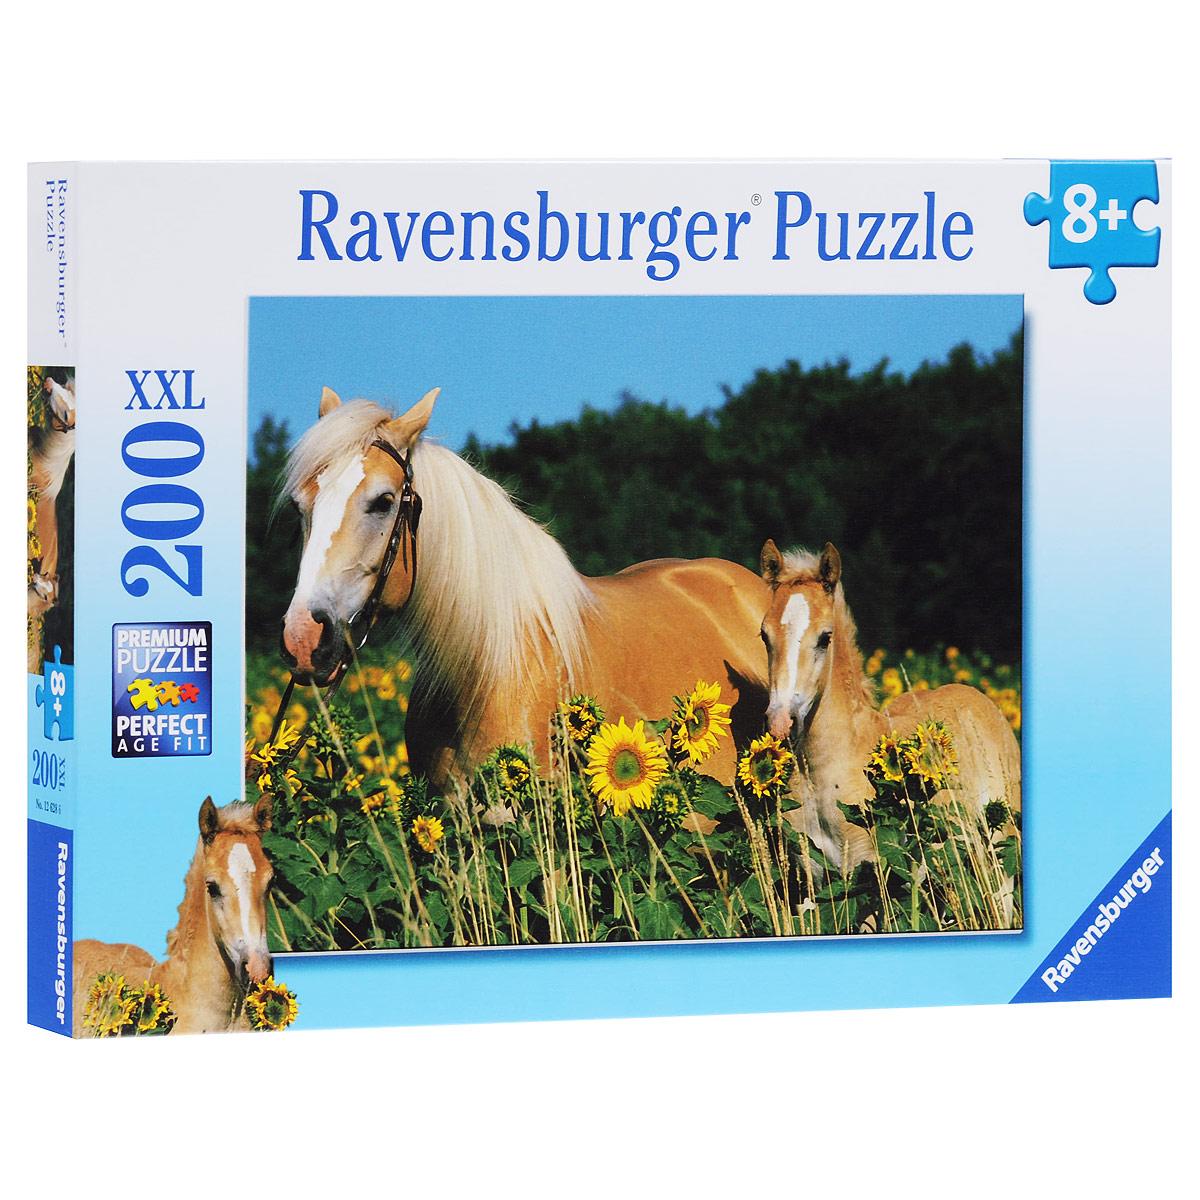 Ravensburger Лошади в подсолнухах. Пазл XXL, 200 элементов